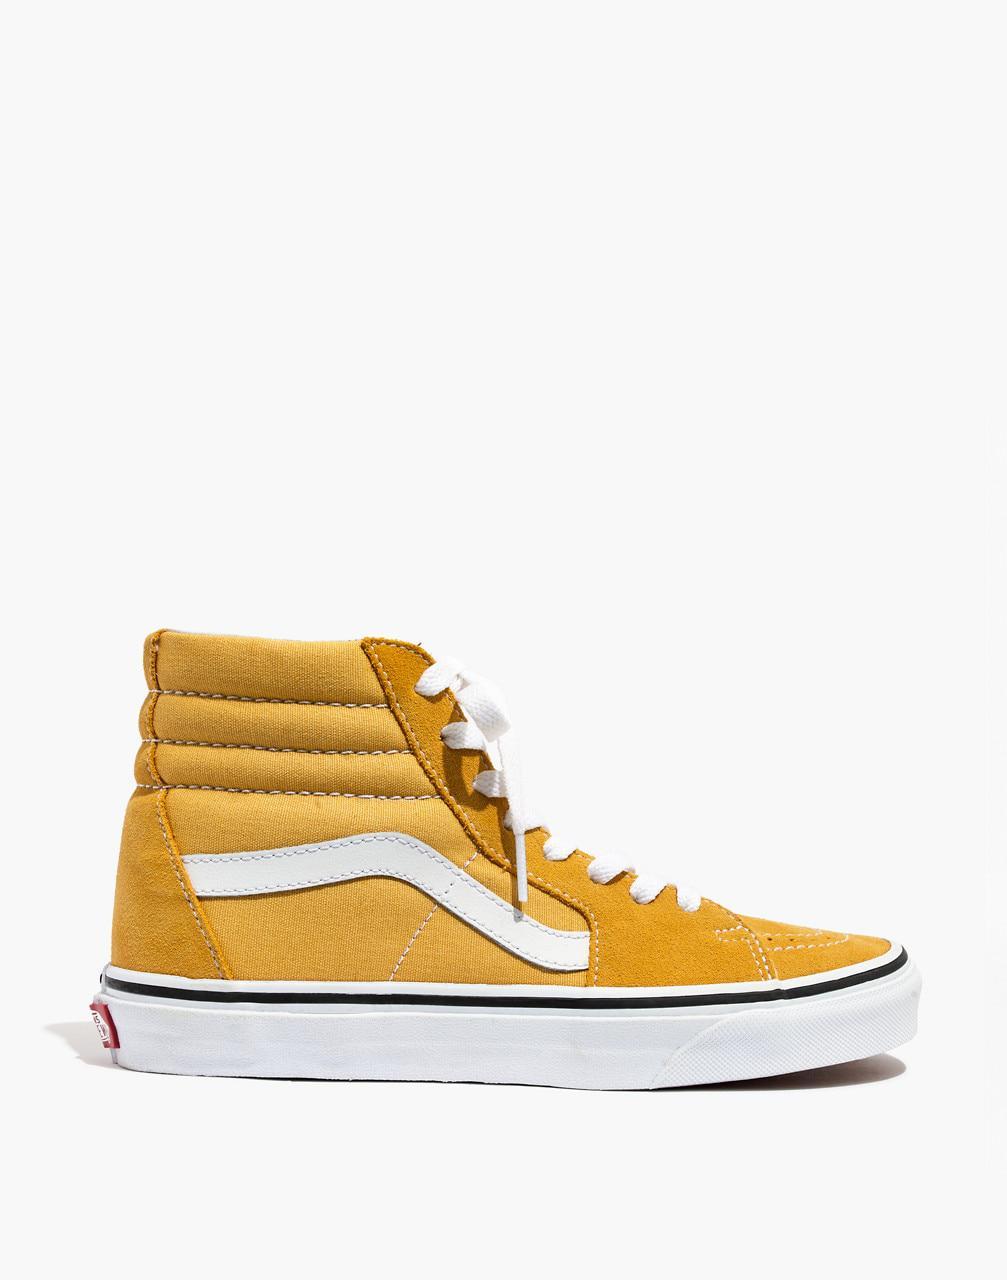 c86e966d2ff4c5 Lyst - Madewell Vans Unisex Sk8-hi High-top Sneakers In Ochre Suede